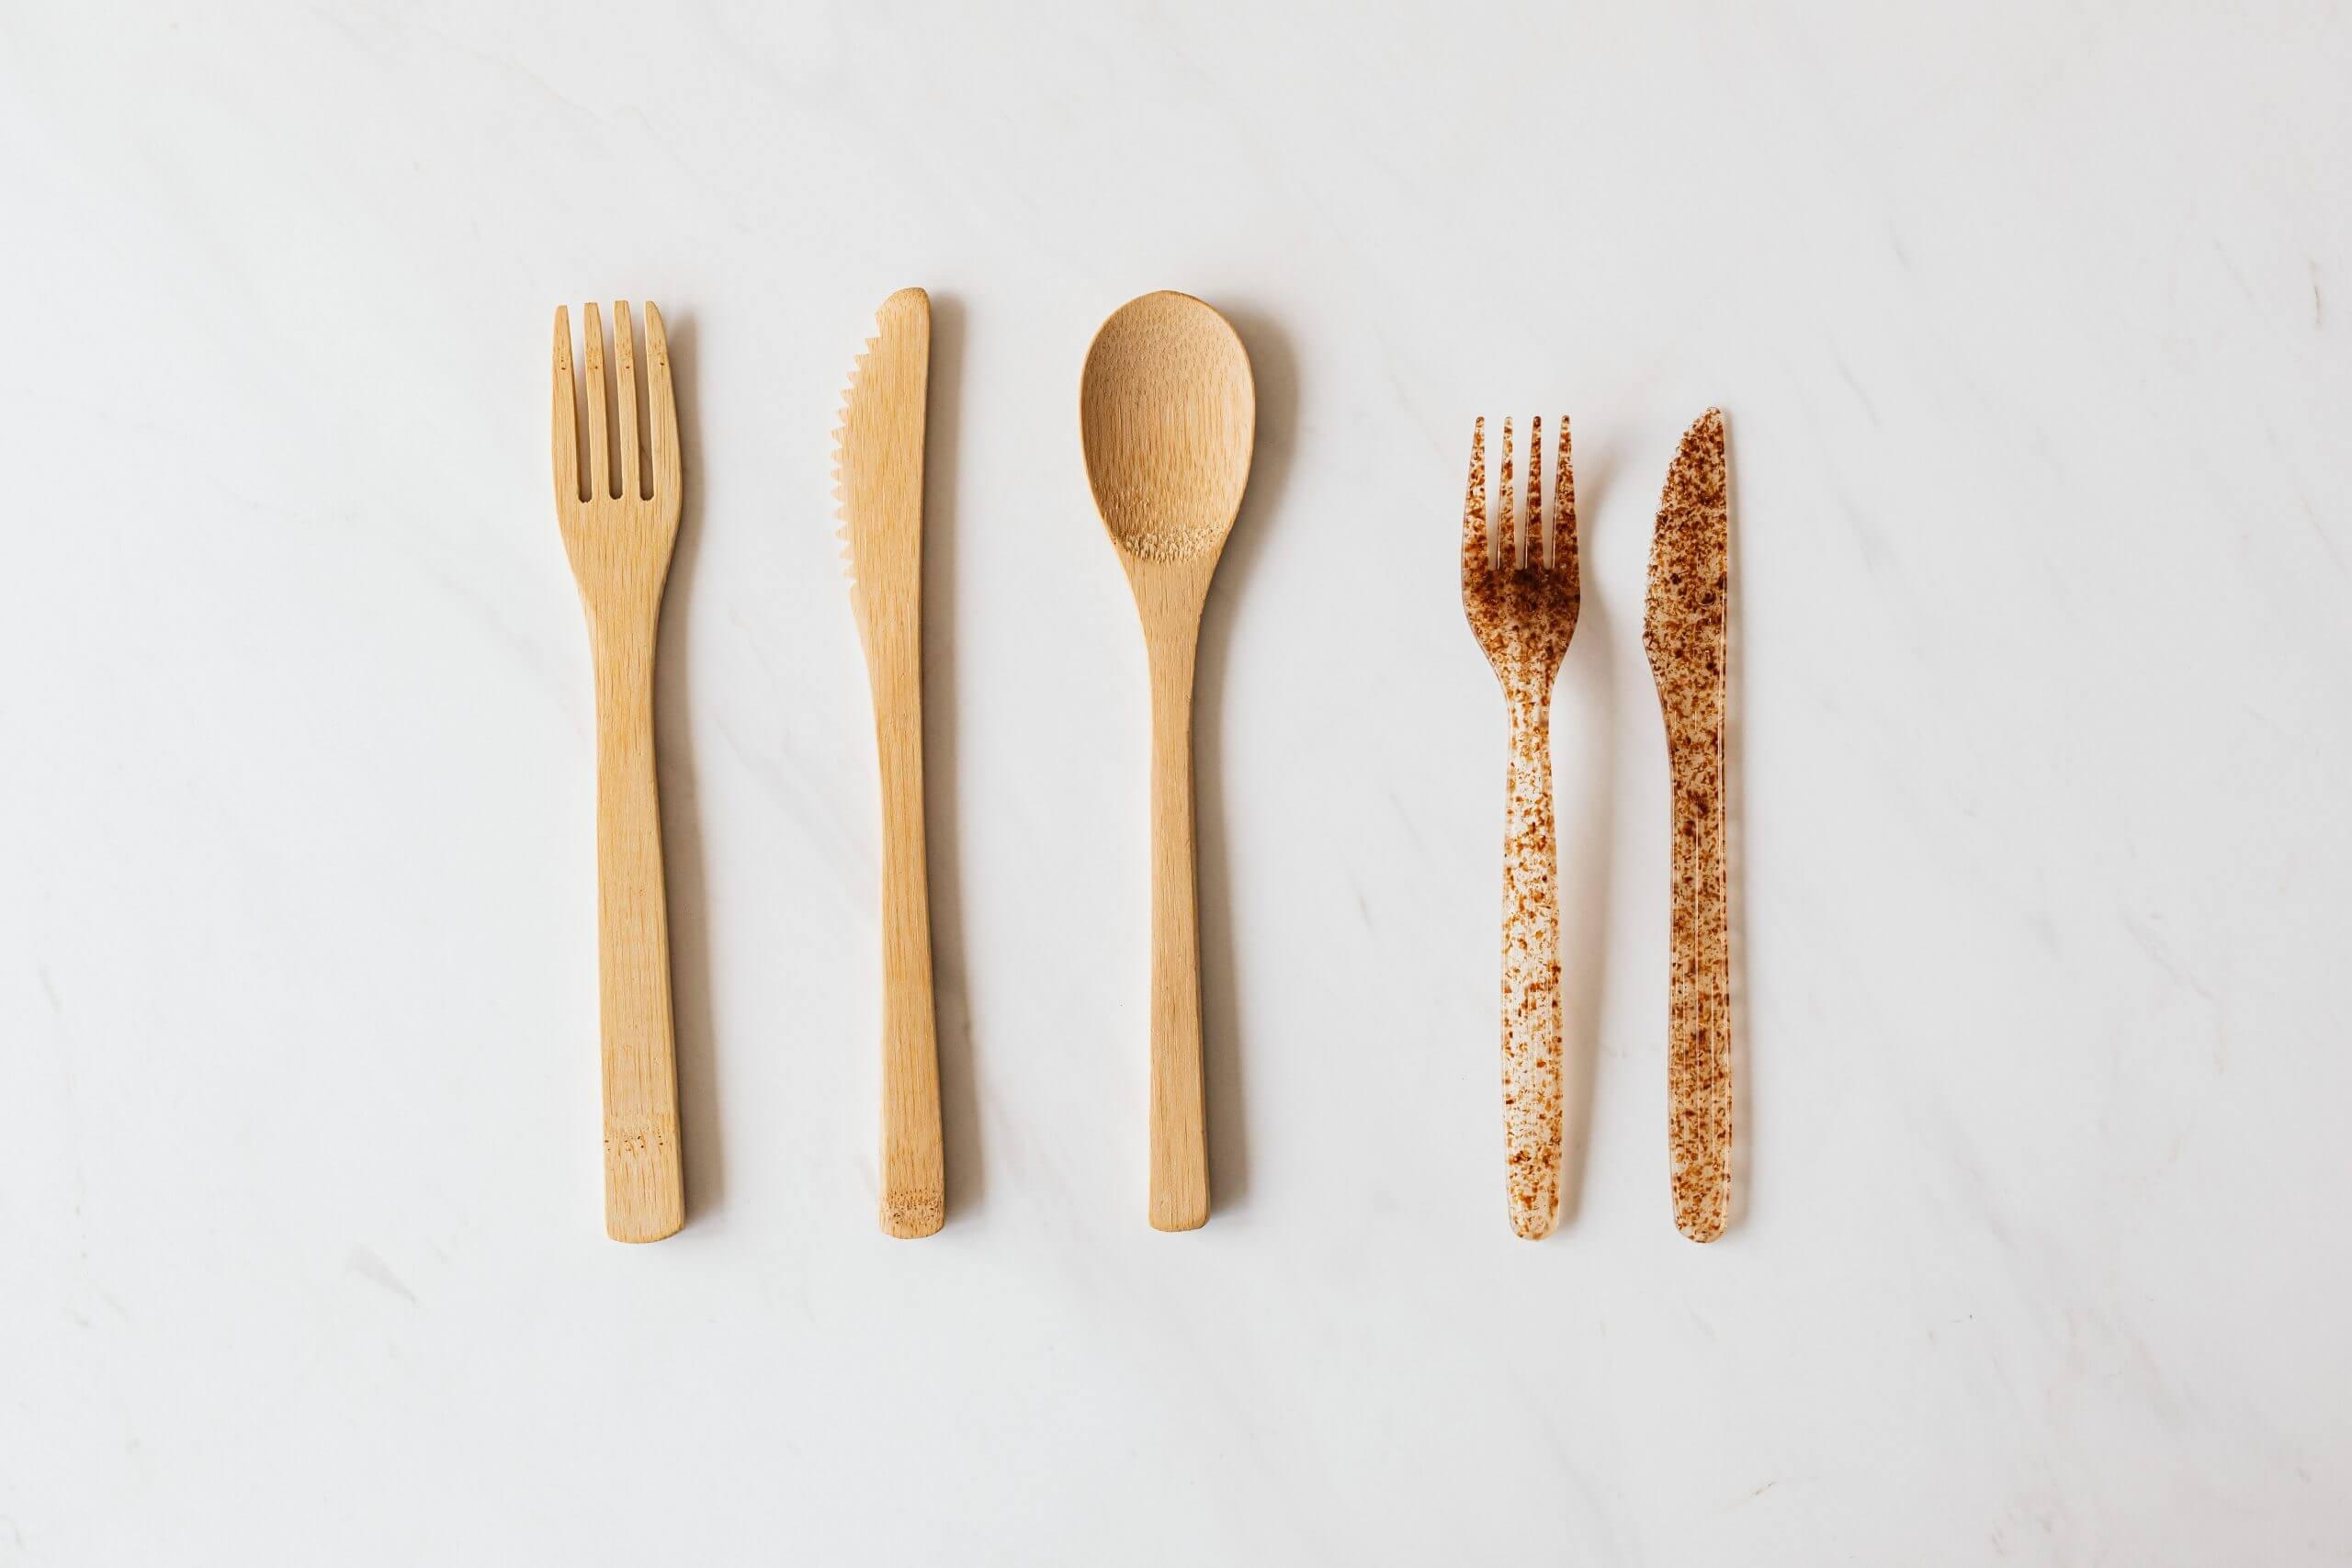 Non compostable plastic cutlery